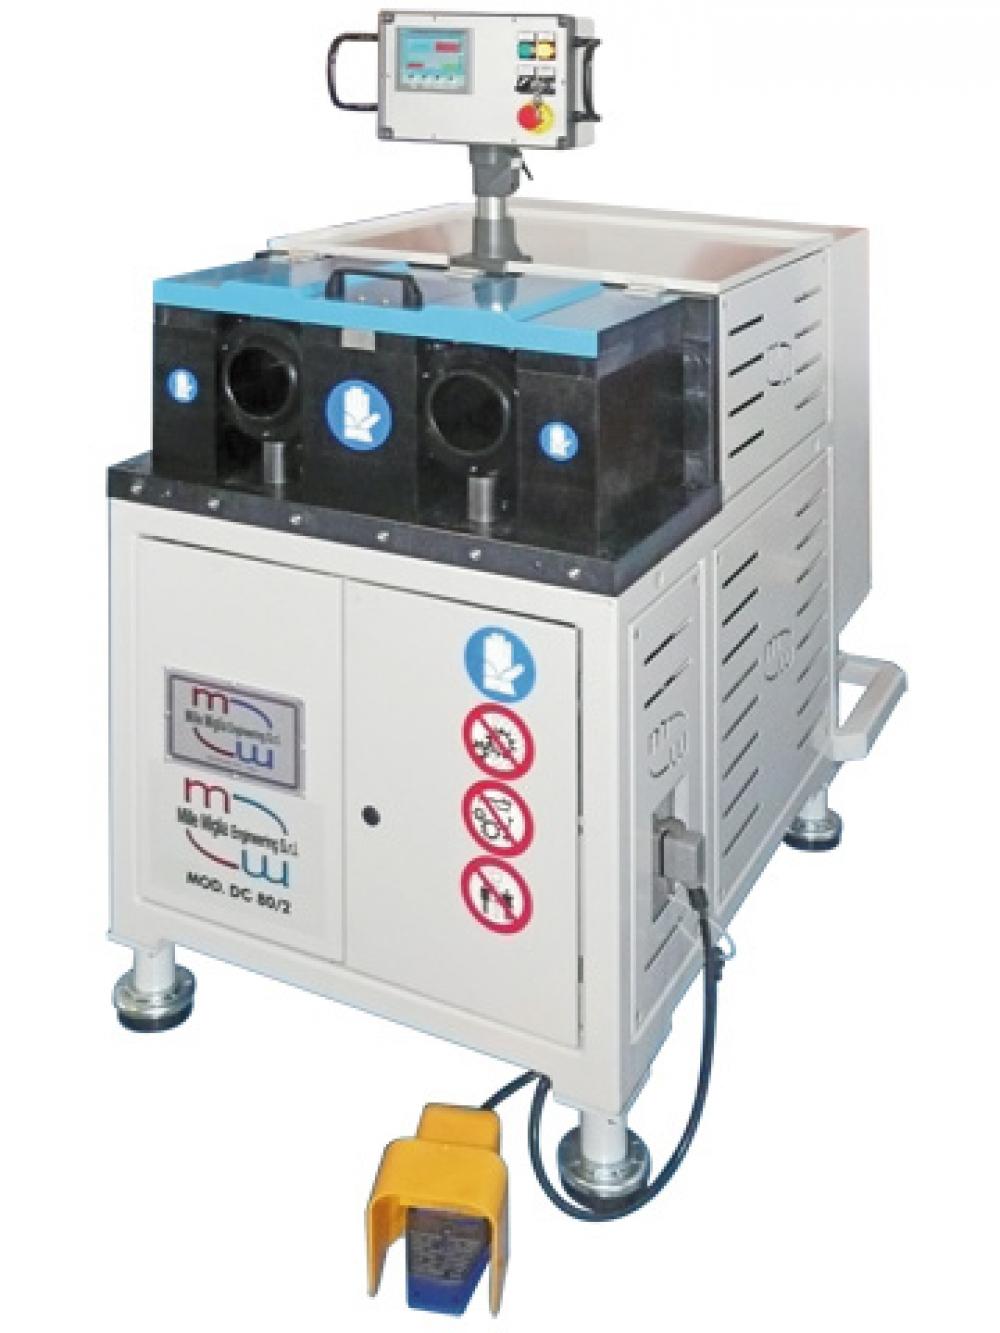 Sv-60 trading system